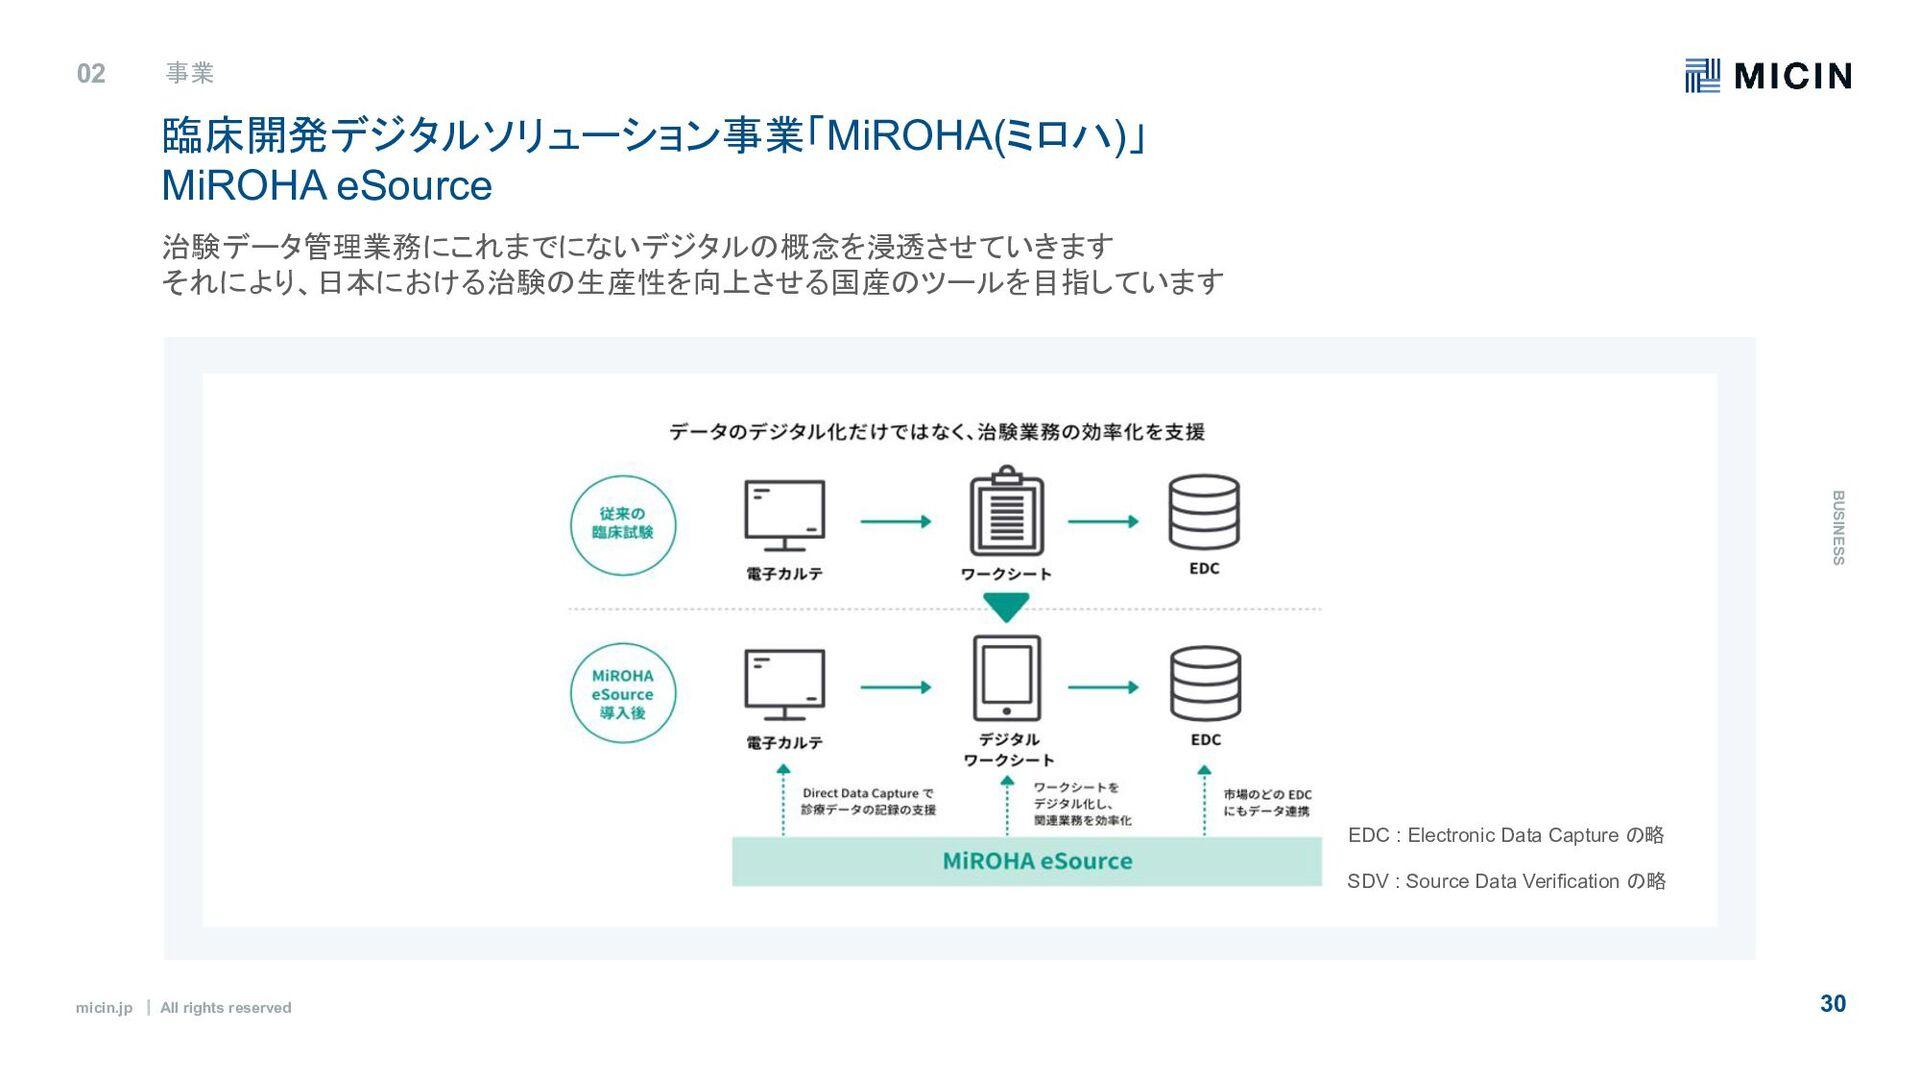 micin.jp ʛ All rights reserved 30 事業内容 02 事業 B ...